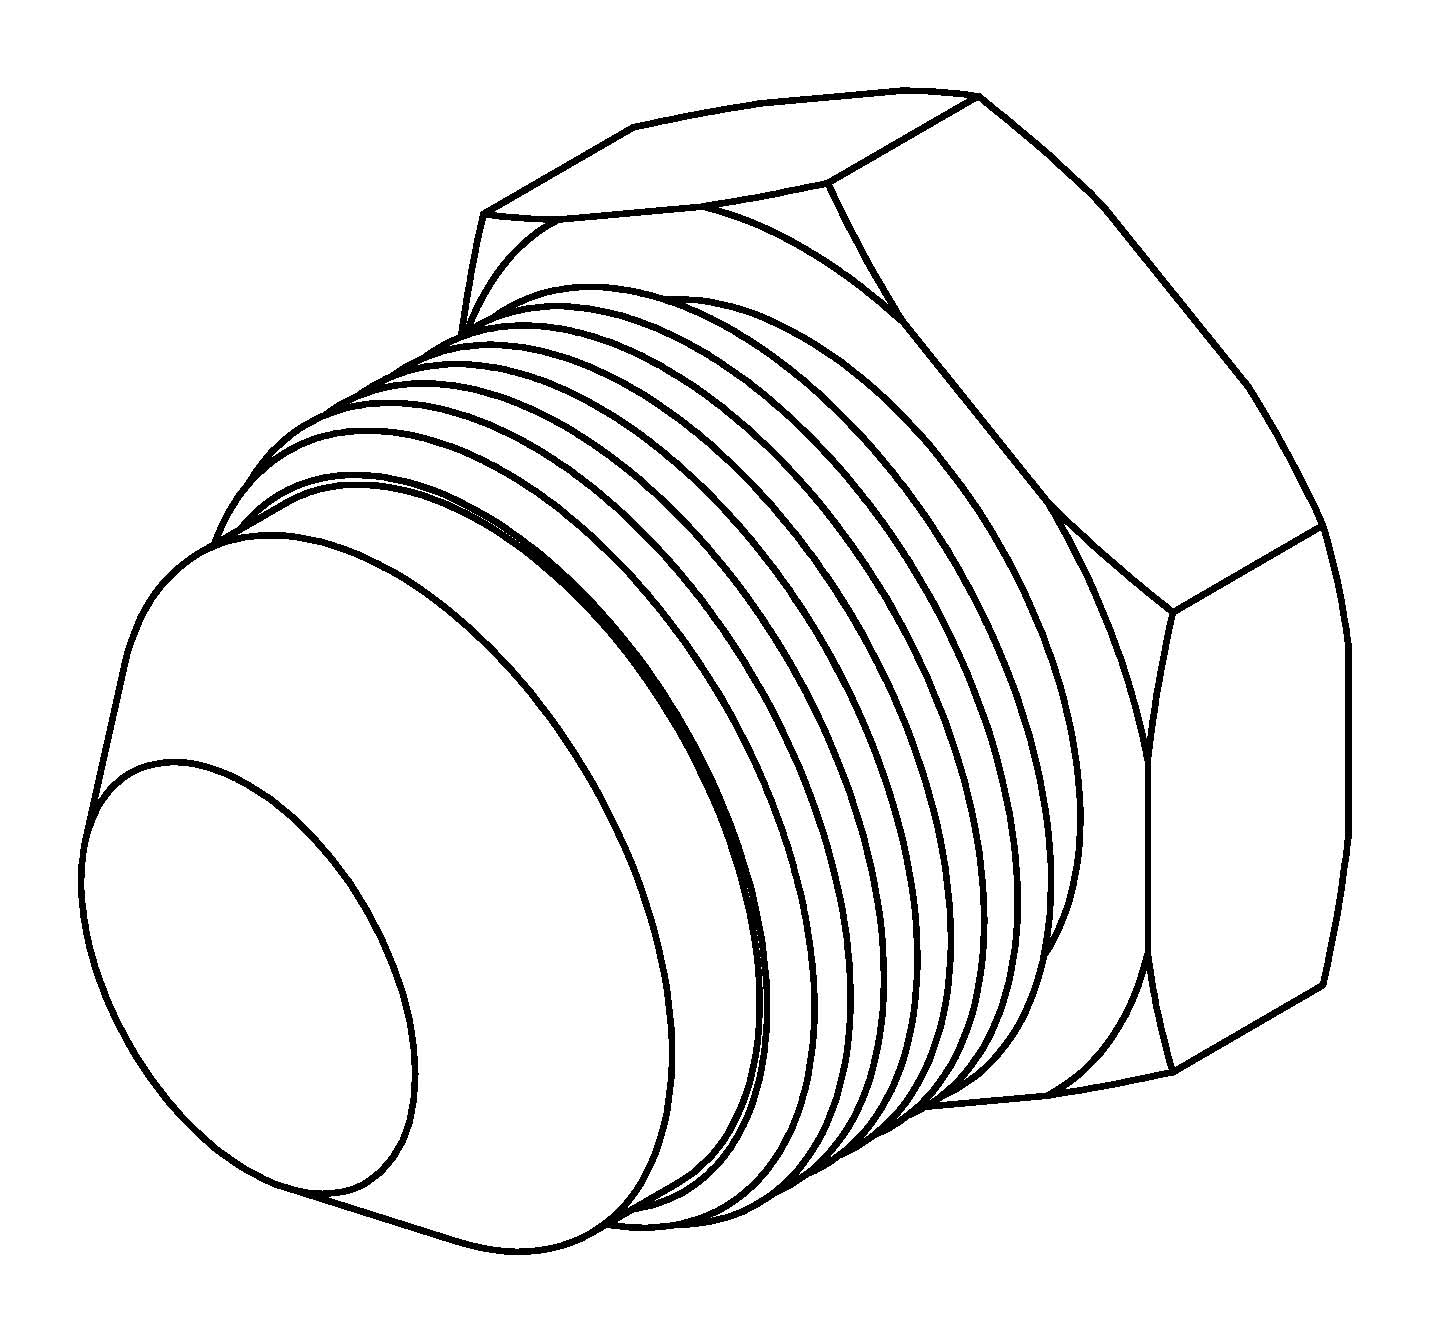 Brakequip Bq172 Weld On Fitting 3 4 X 16nf 1 2 Tube Alum